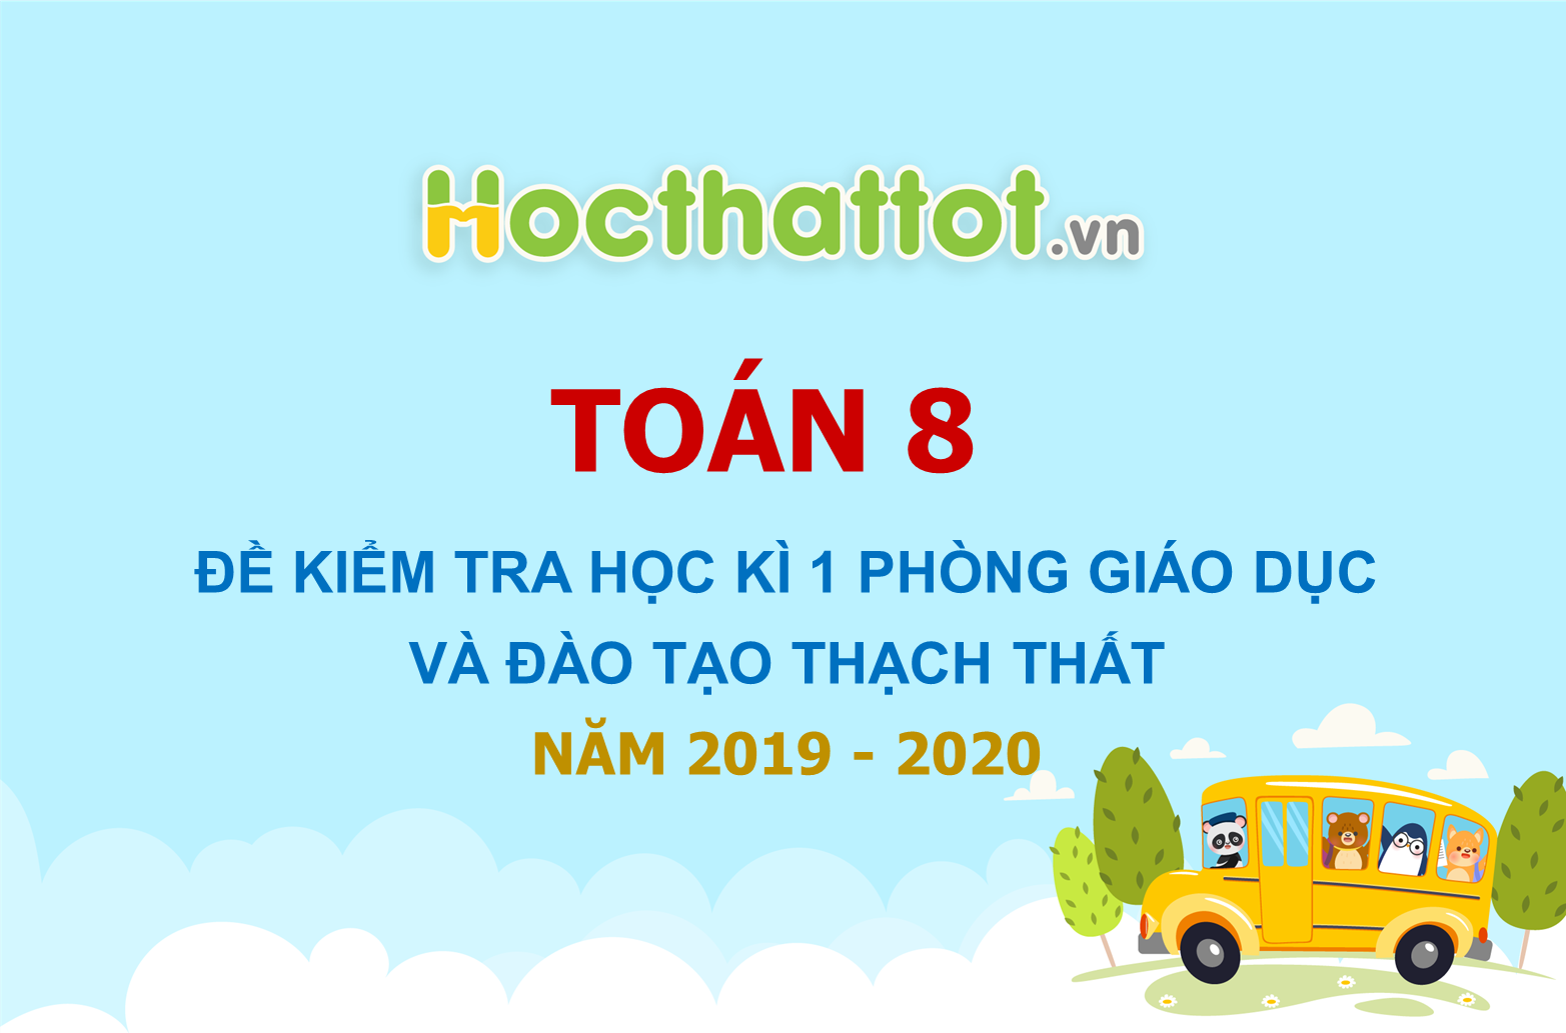 de-thi-hoc-ky-1-toan-8-nam-2019-2020-phong-gddt-thach-that-ha-noi